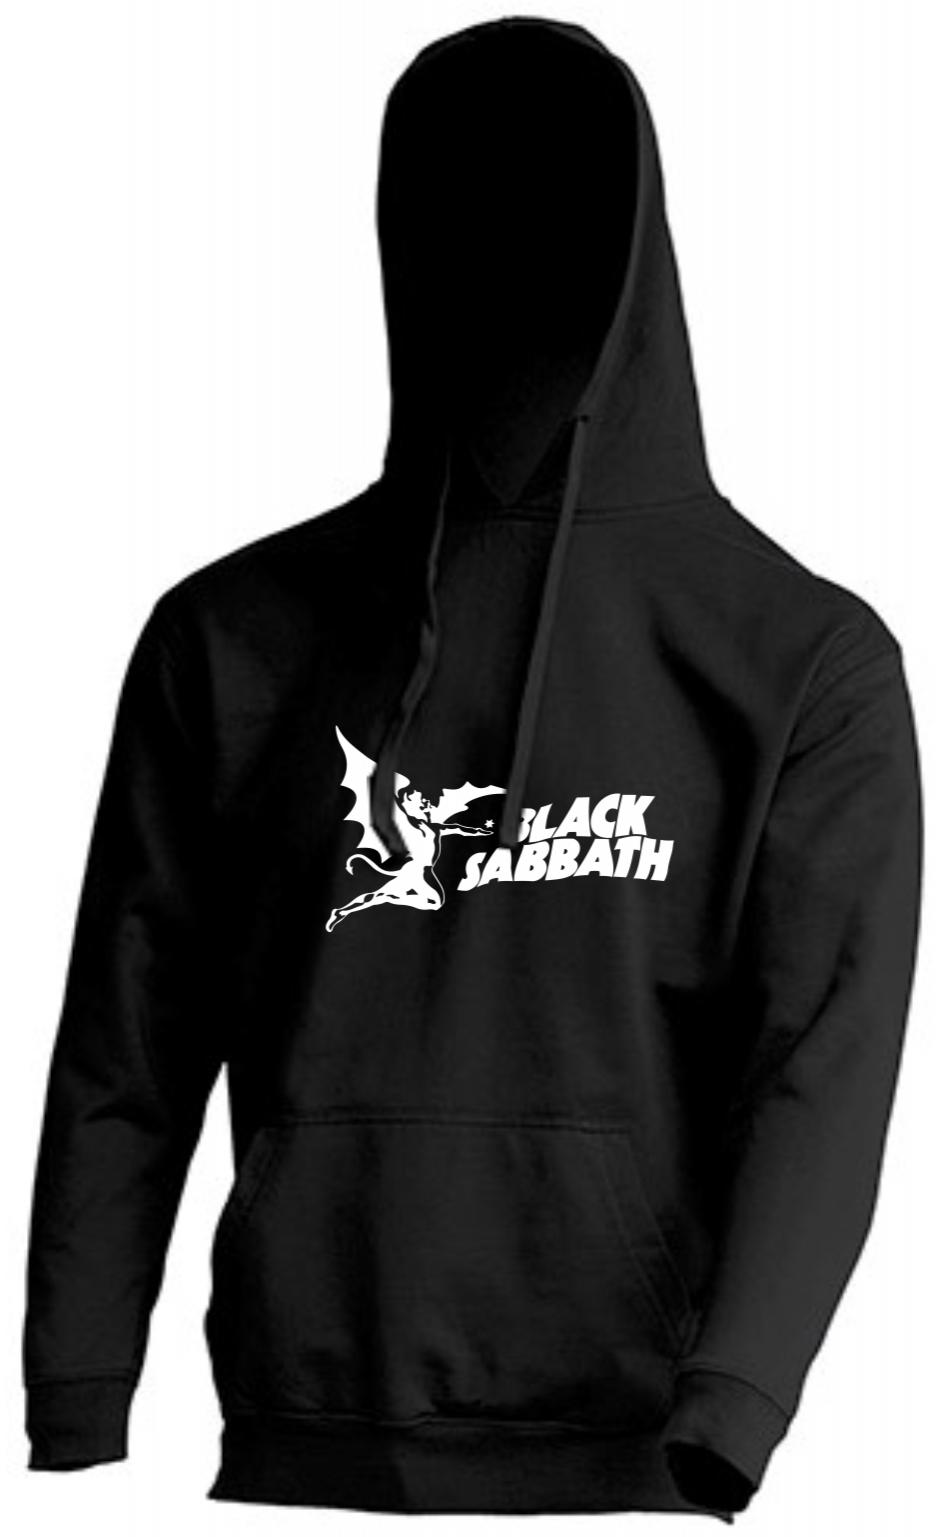 SUDADERA CAPUCHA BLACK SABBATH